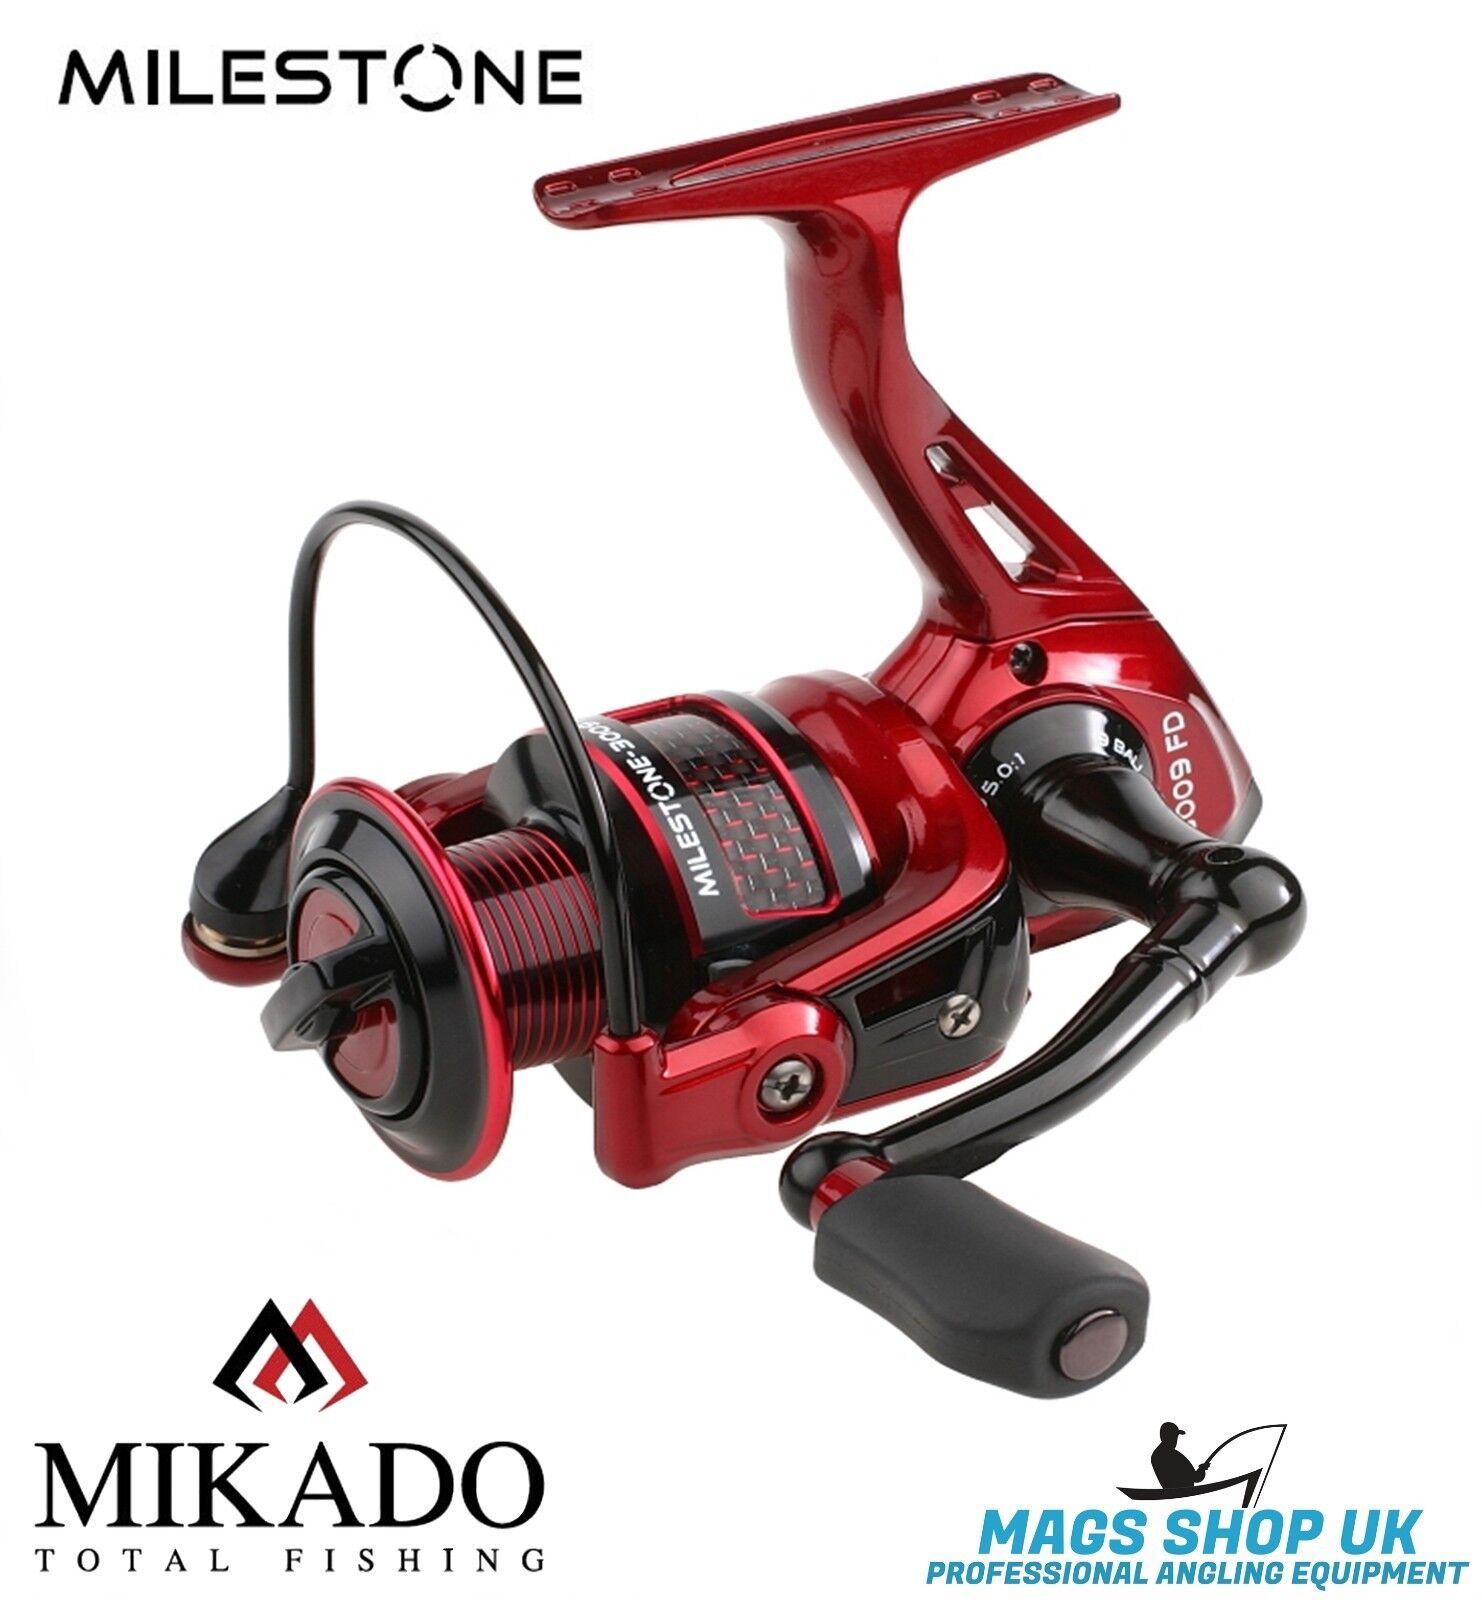 MIKADO ''MILESTONE'' FISHING REEL,KDA077,5.0:1, 8+1,SPINNING, 12 MONTHS WARRANTY